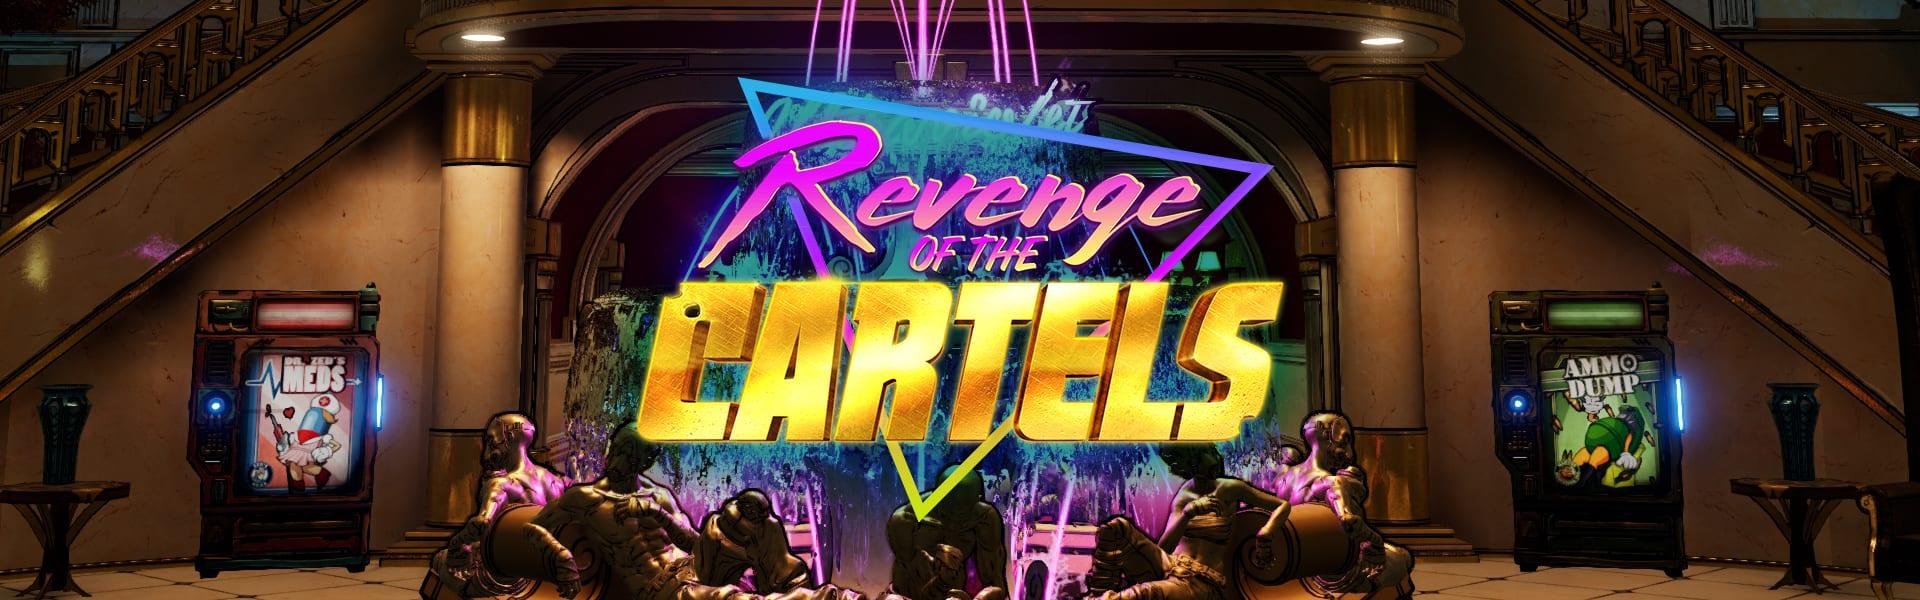 OPQ System Borderlands 3 Revenge of the Cartels